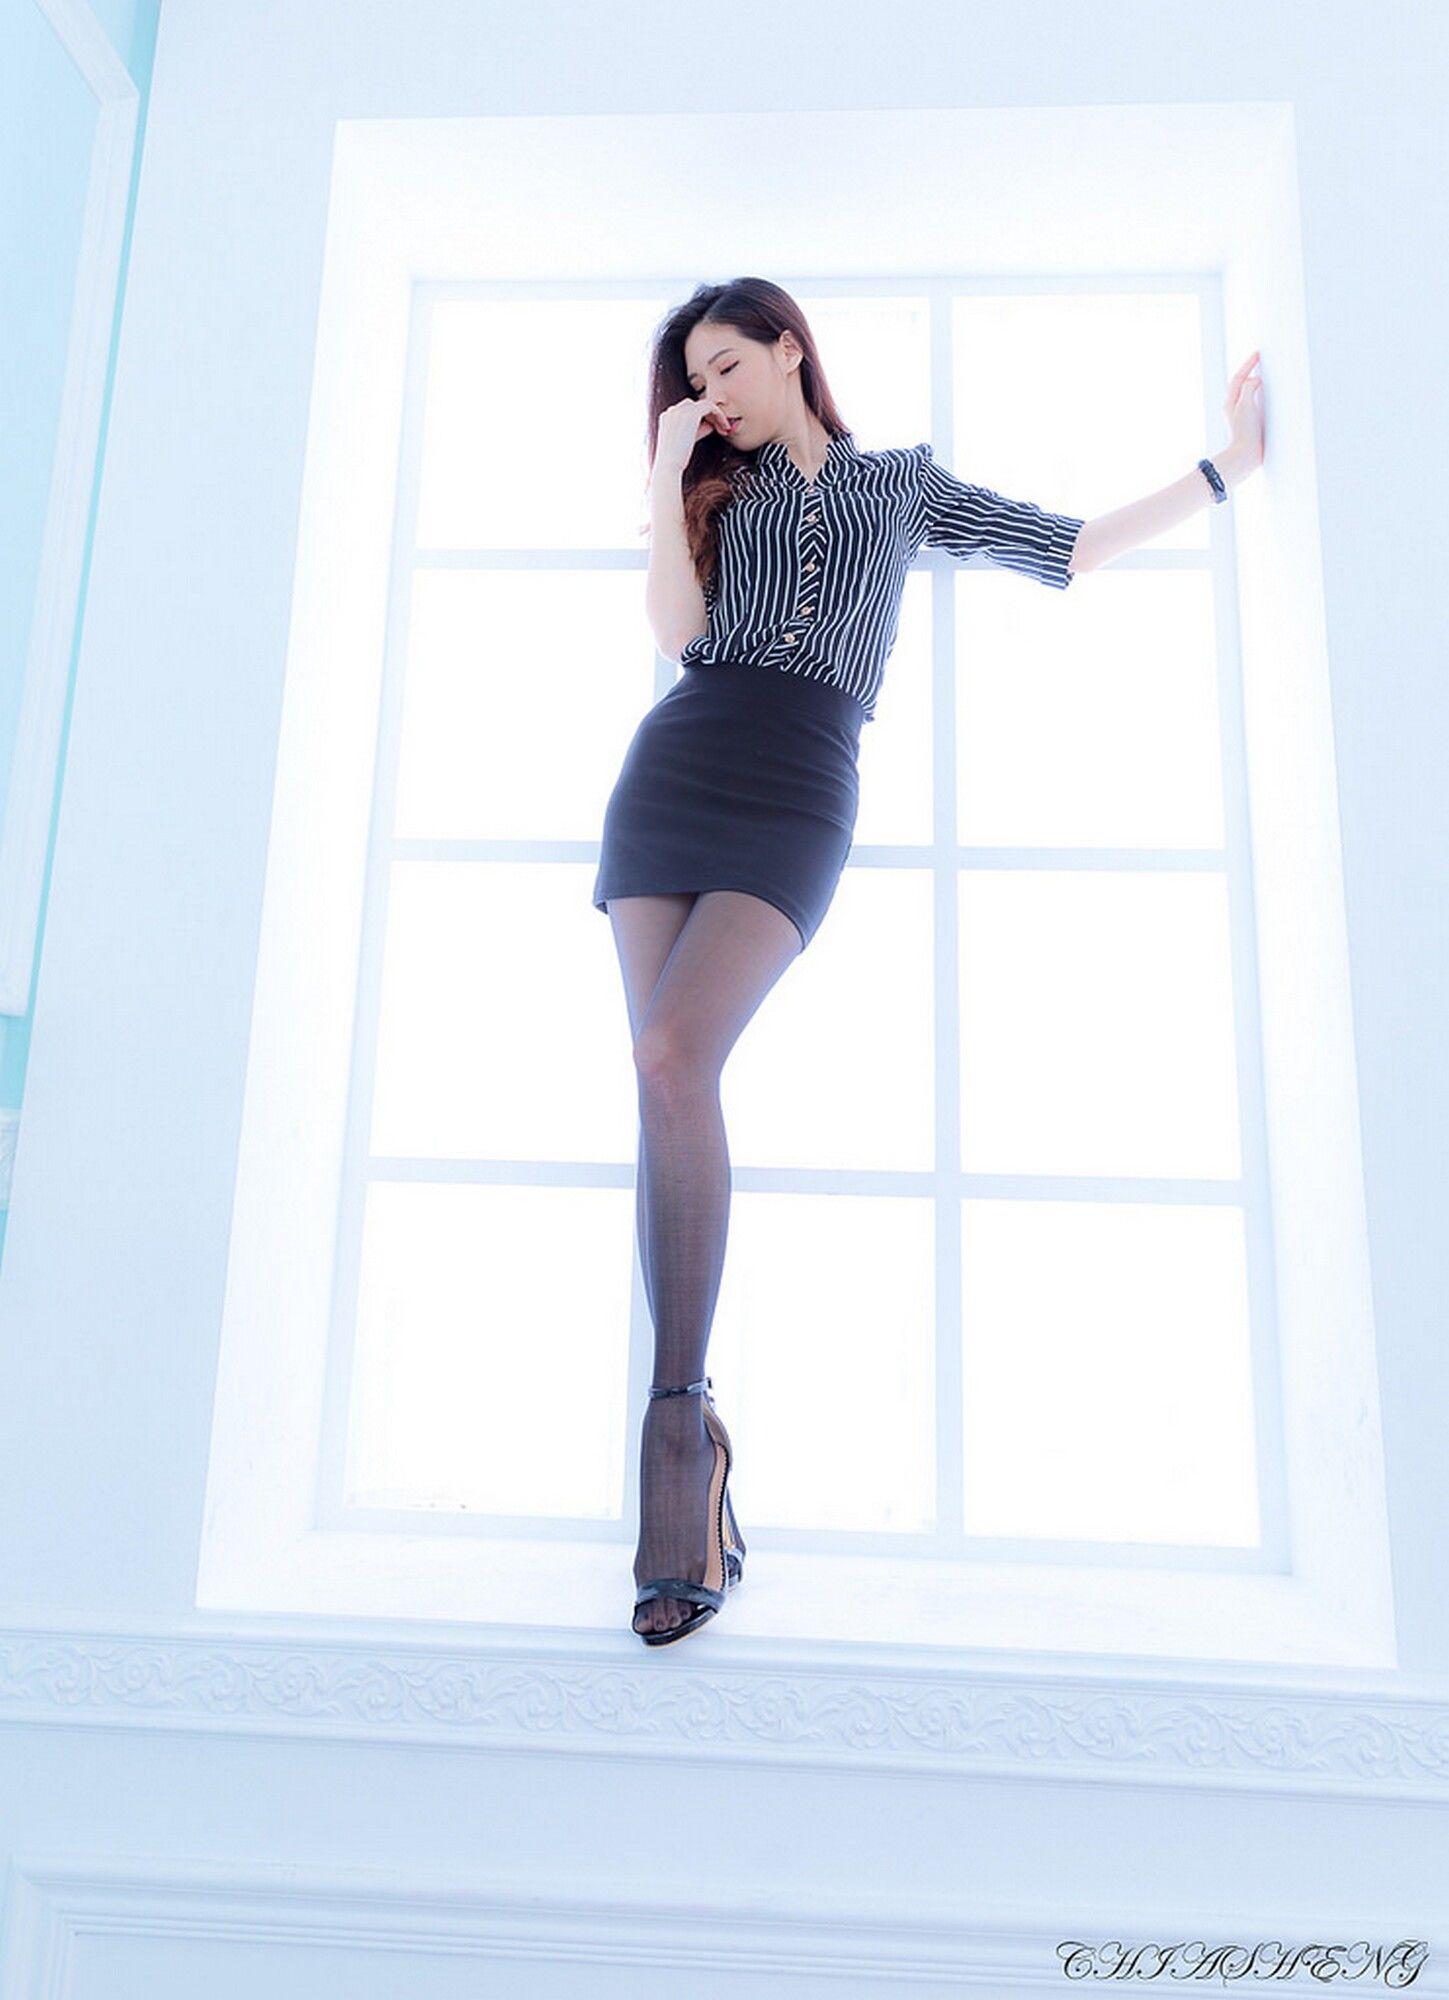 VOL.142 [台湾正妹]丝袜美腿黑丝OL美女包臀裙美女:吴若dudu超高清个人性感漂亮大图(30P)